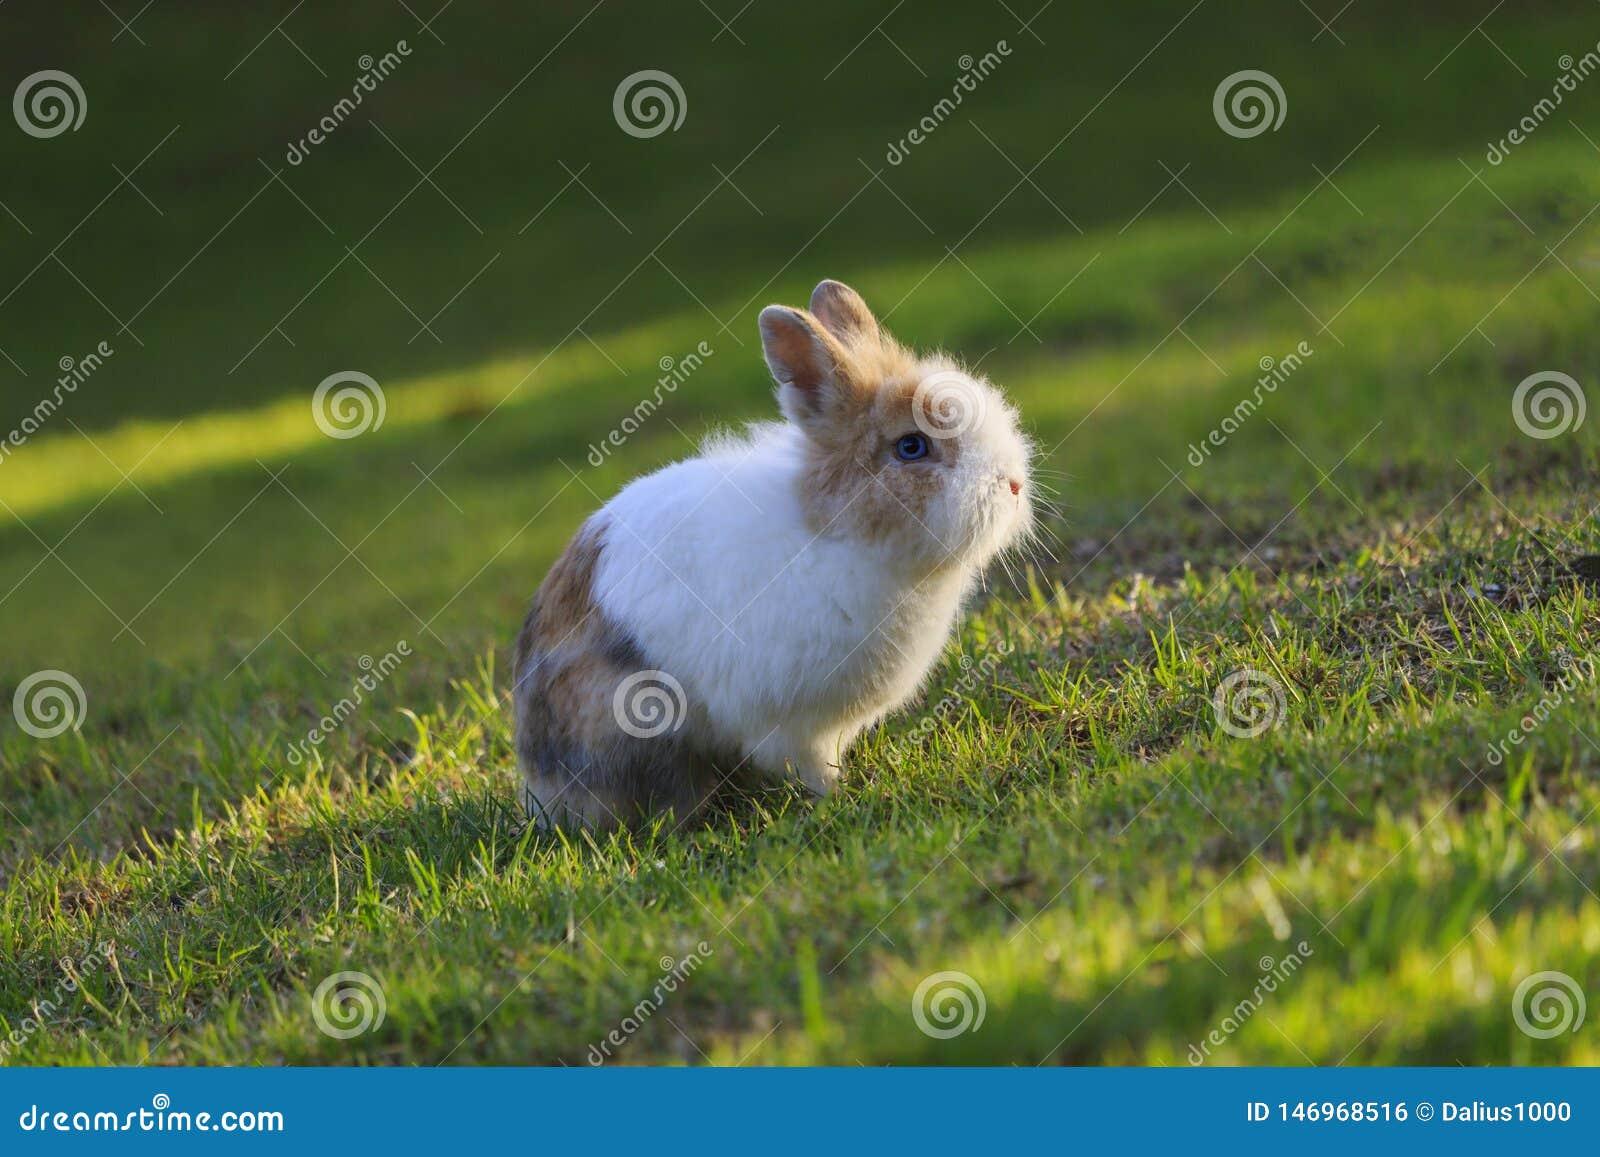 Netherland Dwarf rabbit sitting on grass during a sunset